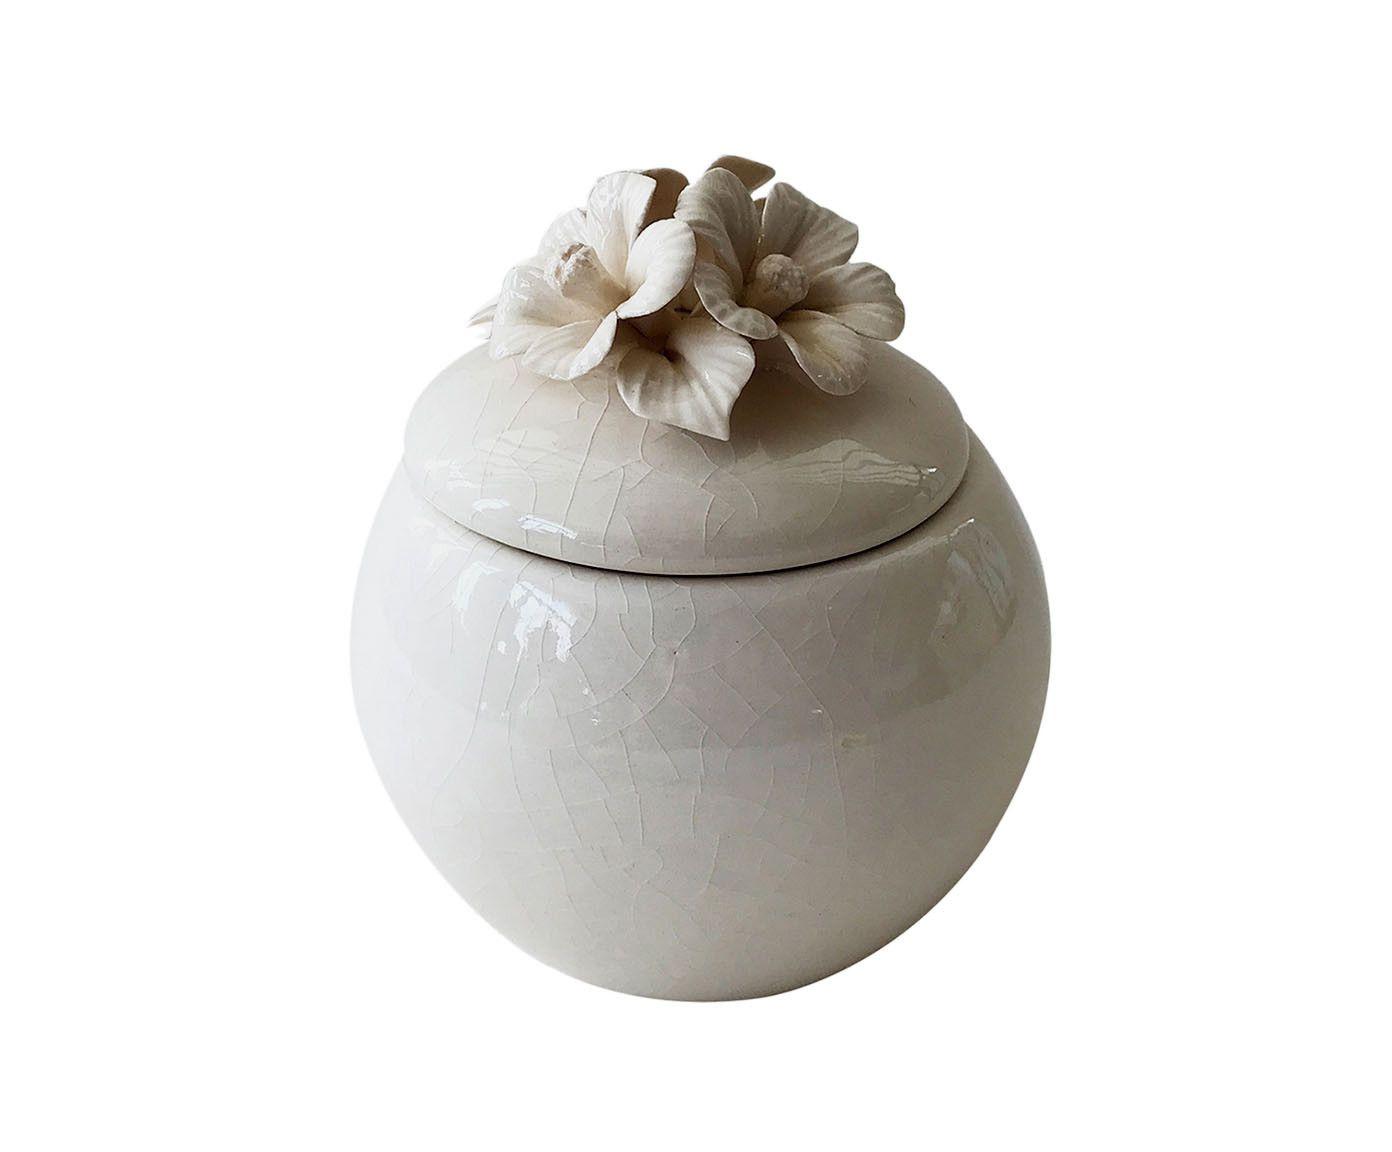 Pote Decorativo Flor Branco - 8cm   Westwing.com.br